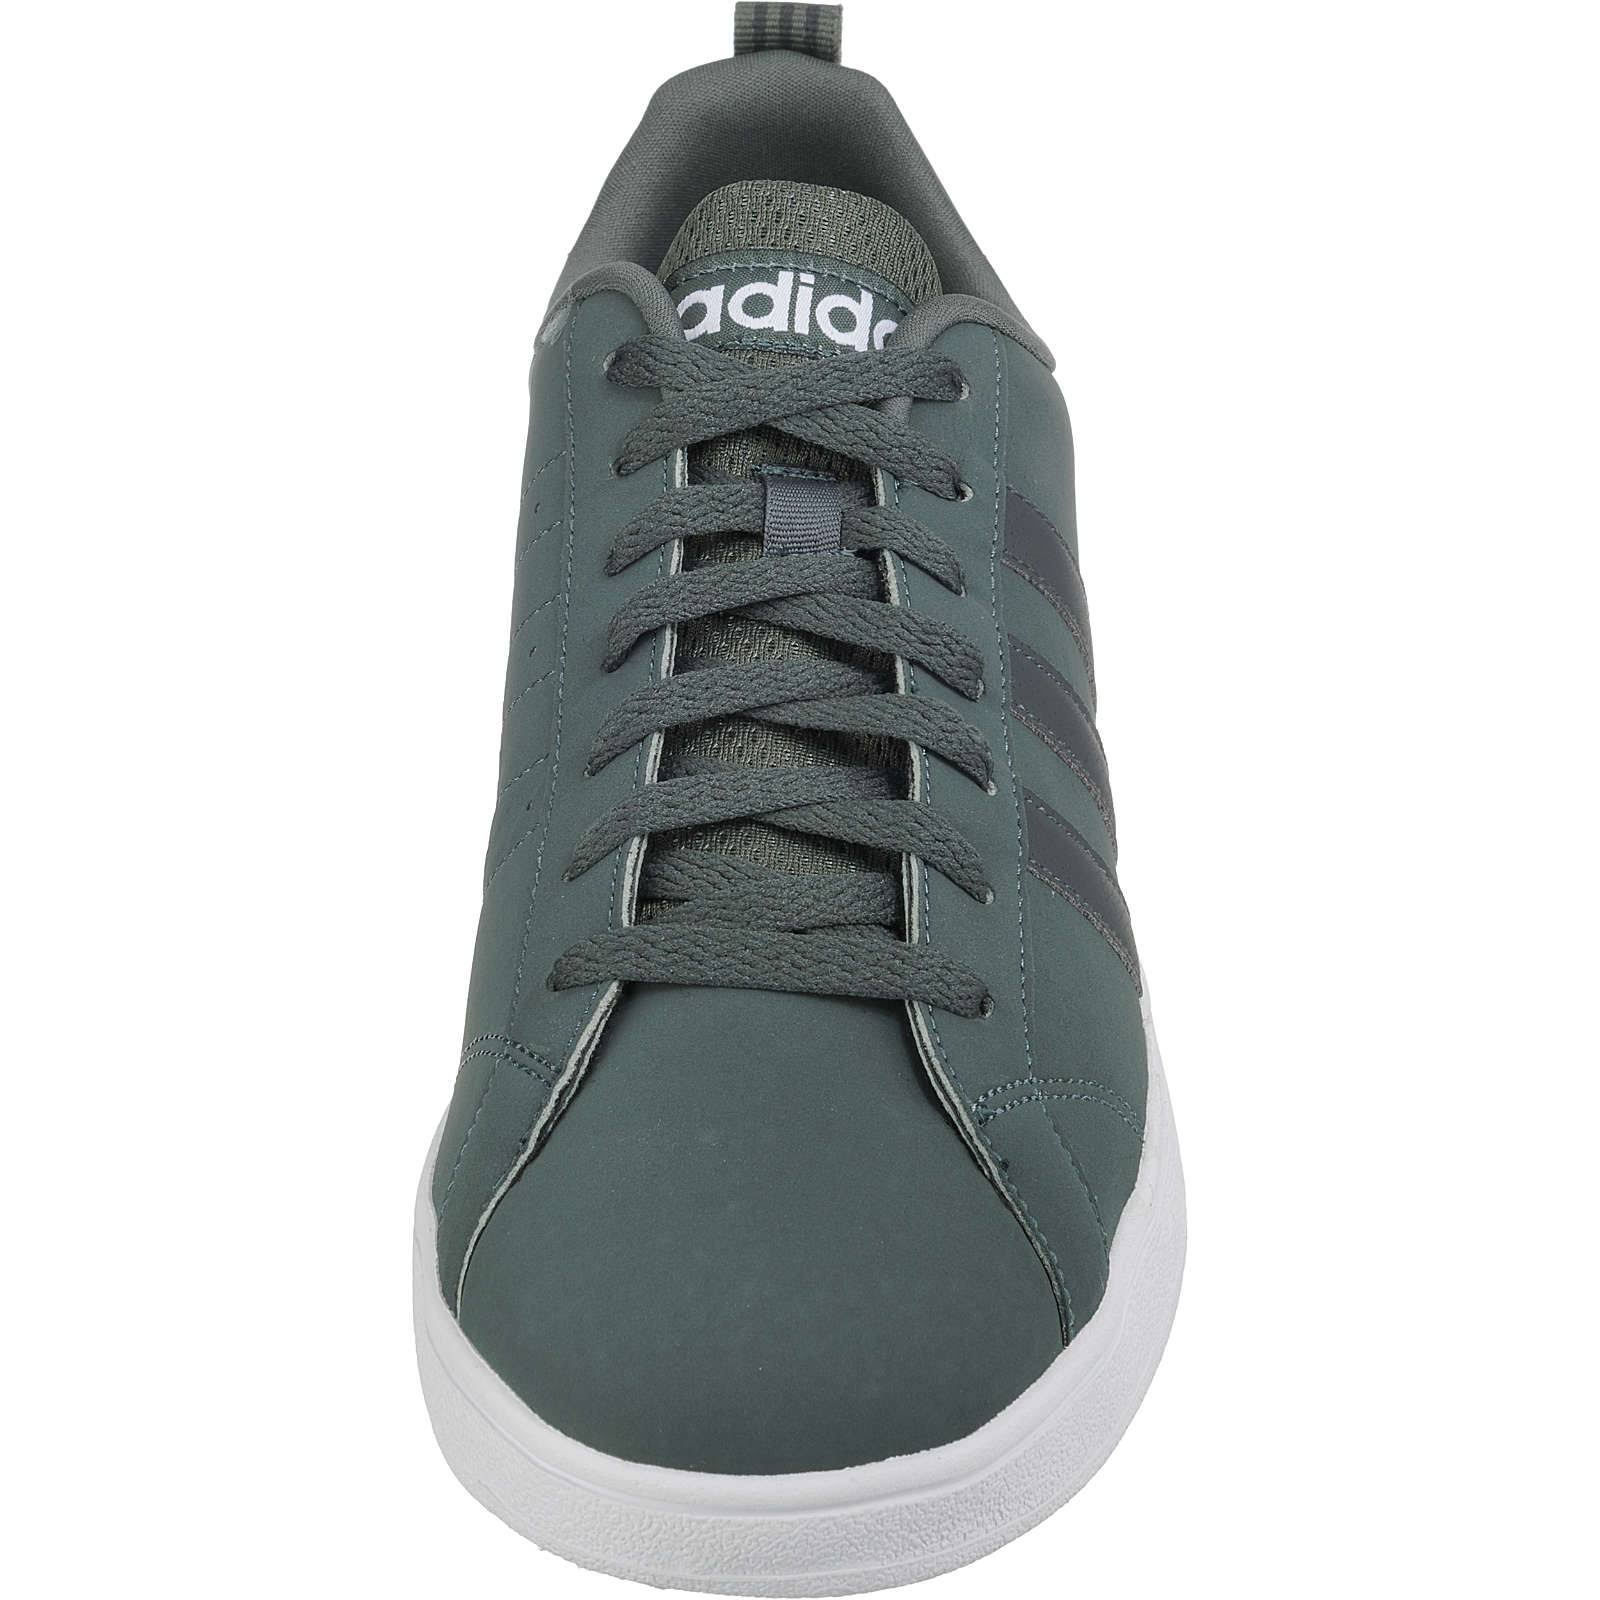 Darkgreen Darkgreen Scarpe Advantage Scarpe Advantage Adidas Vs Adidas Vs 0wmN8n